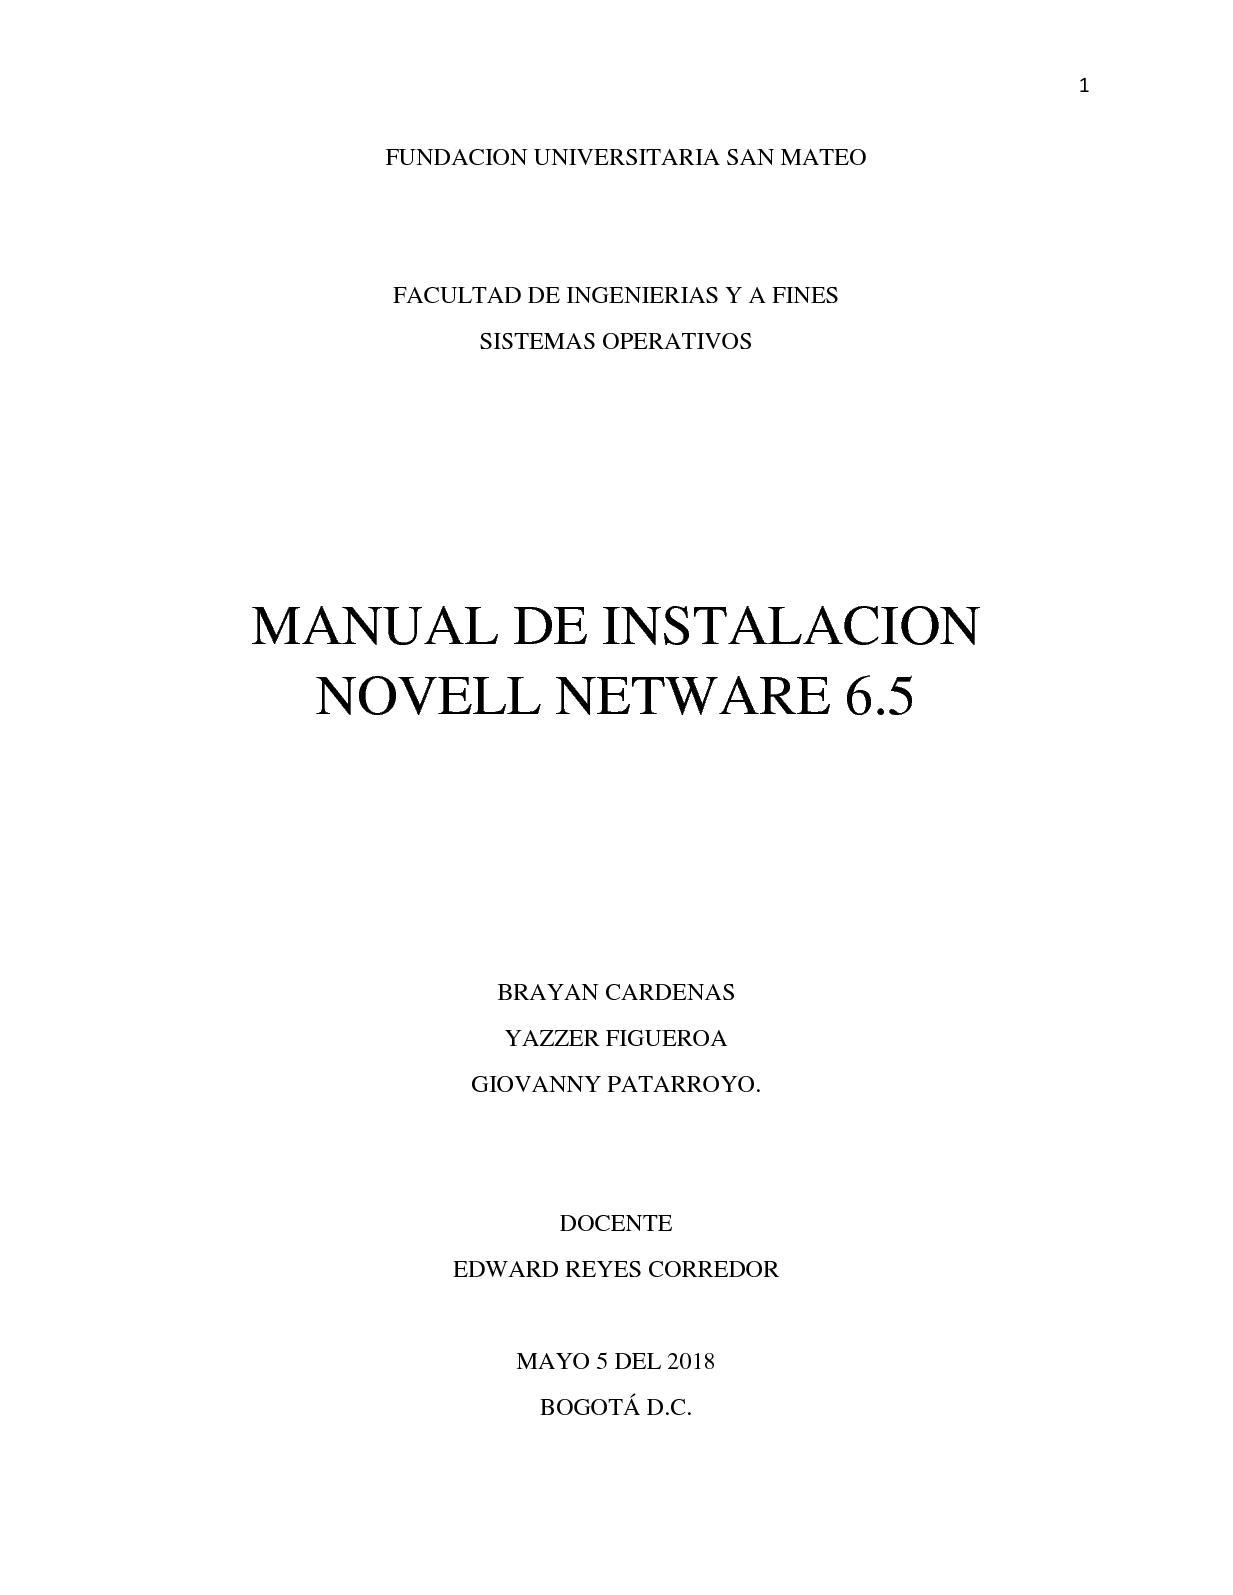 netware 6.5 iso